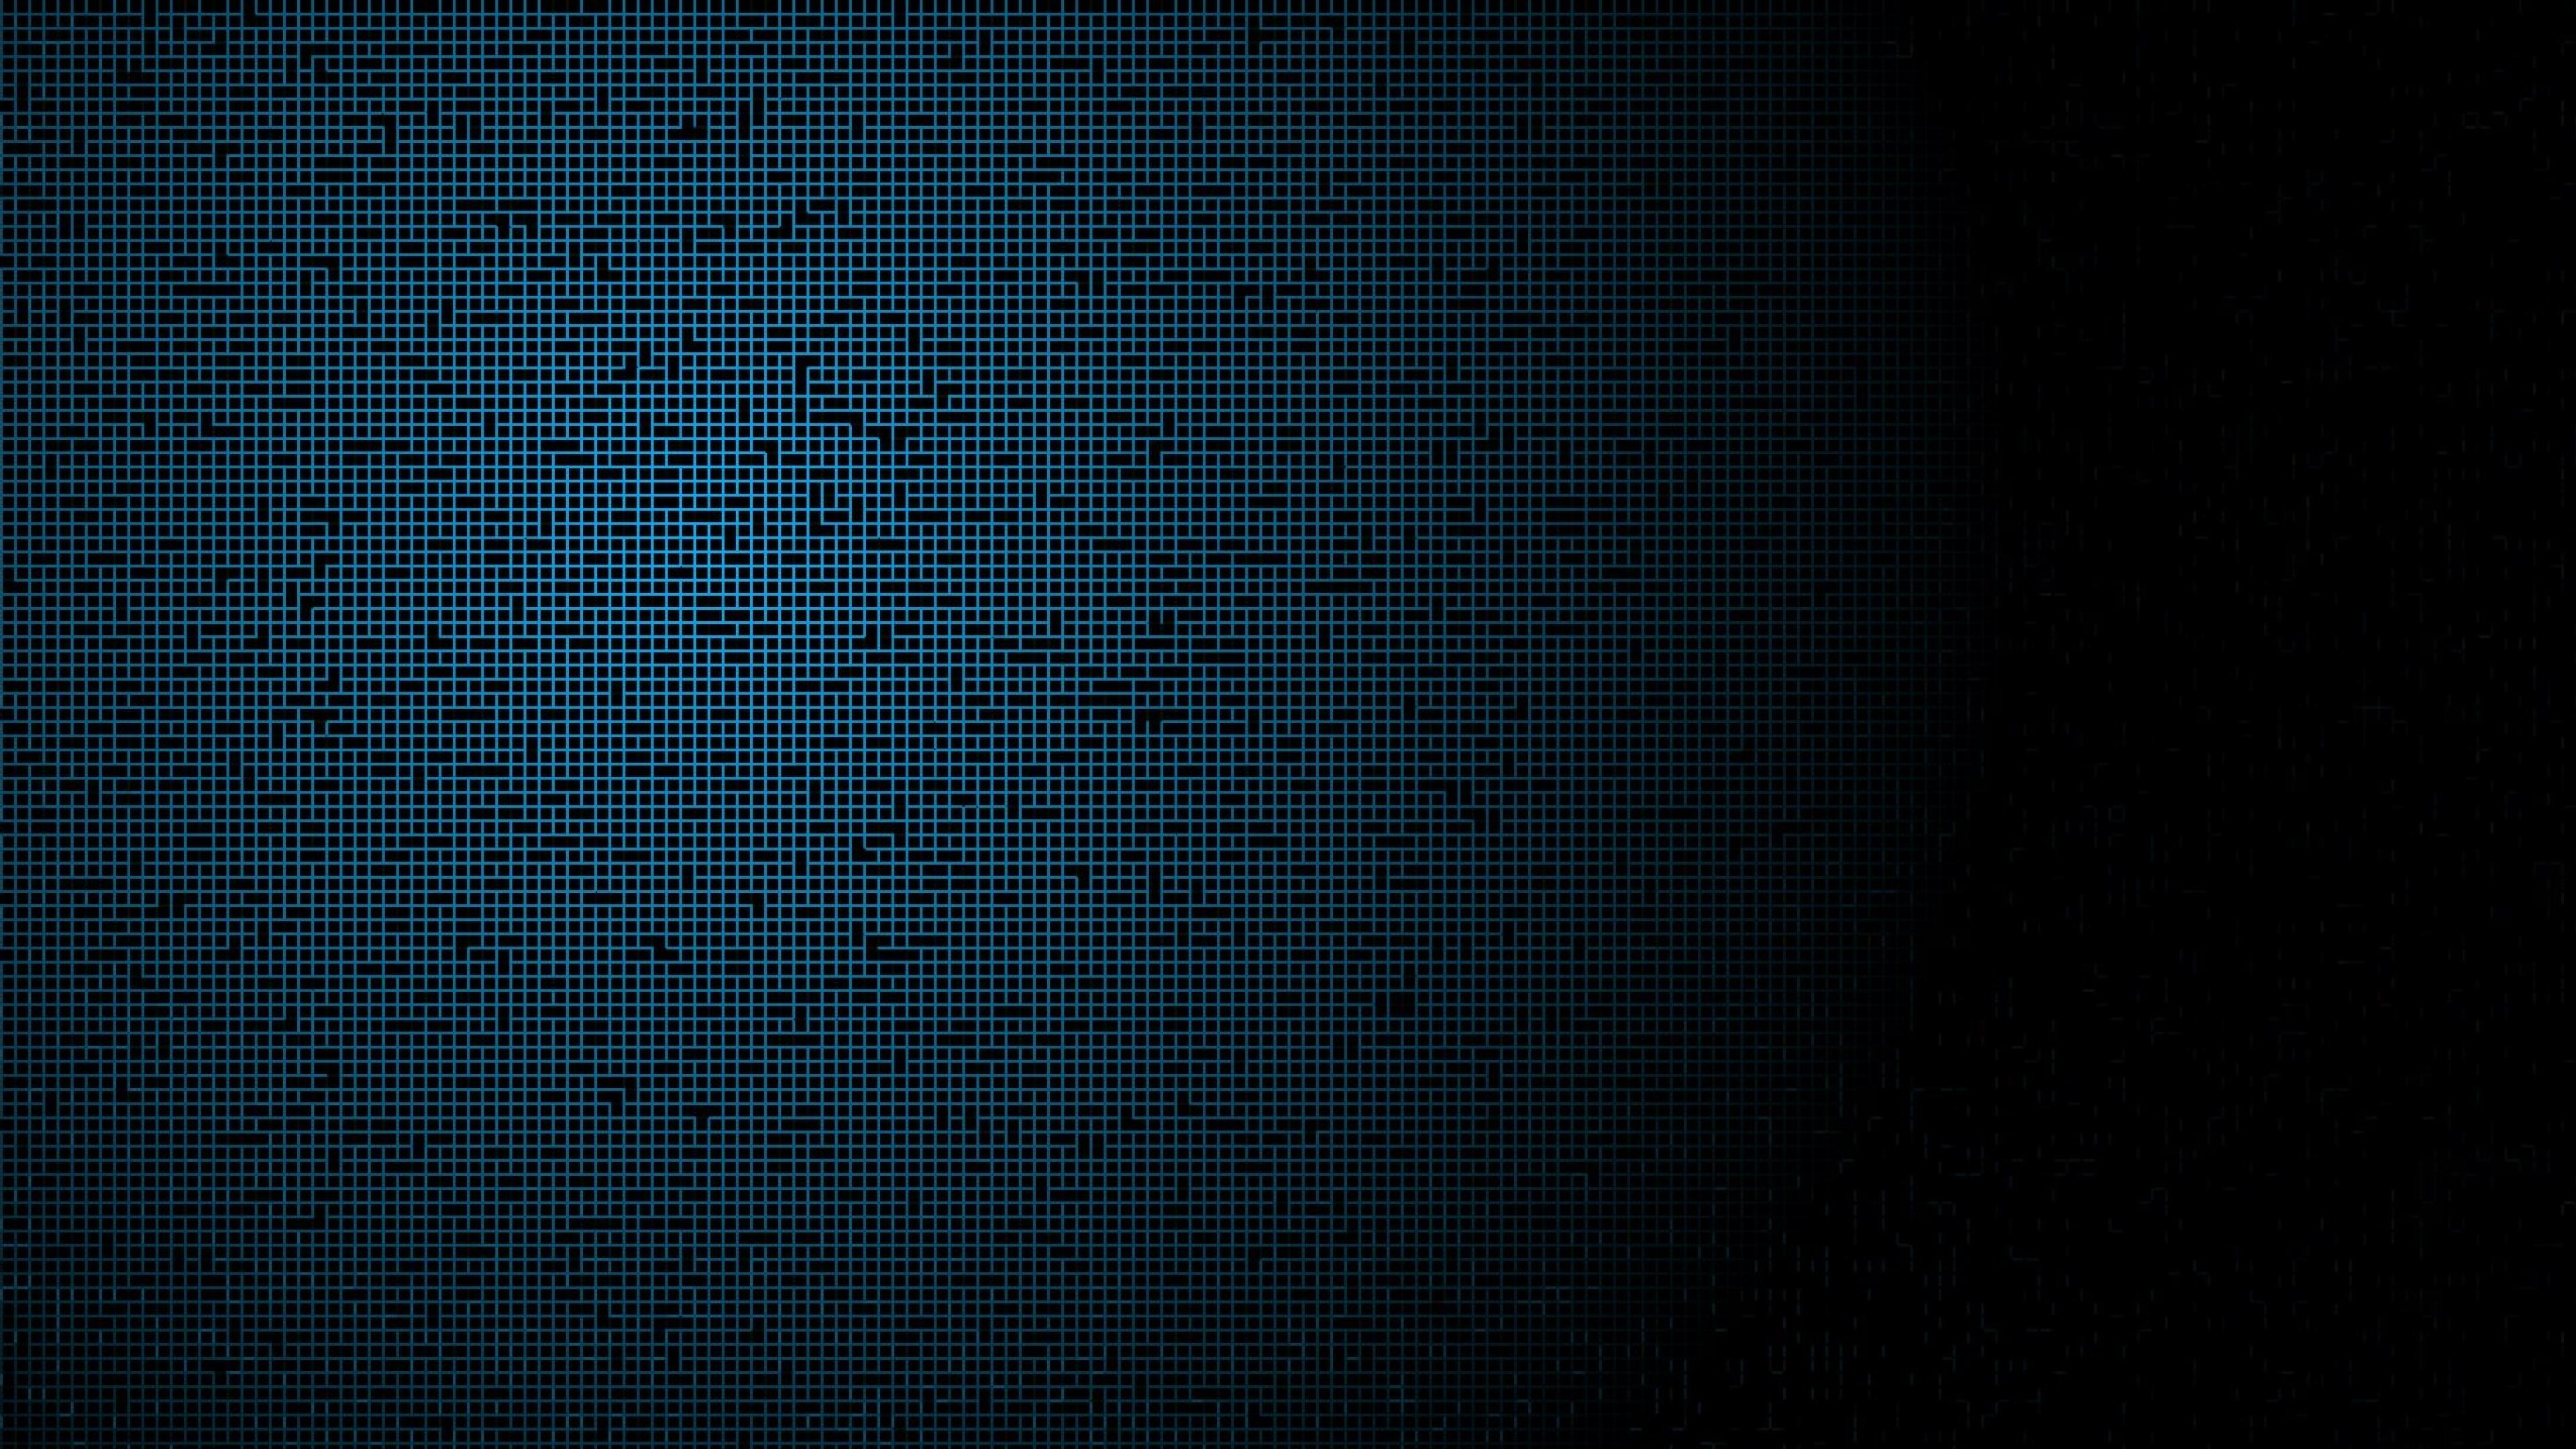 Hexagon Wallpaper 3d Grid Texture Widescreen Hd Wallpapers Media File